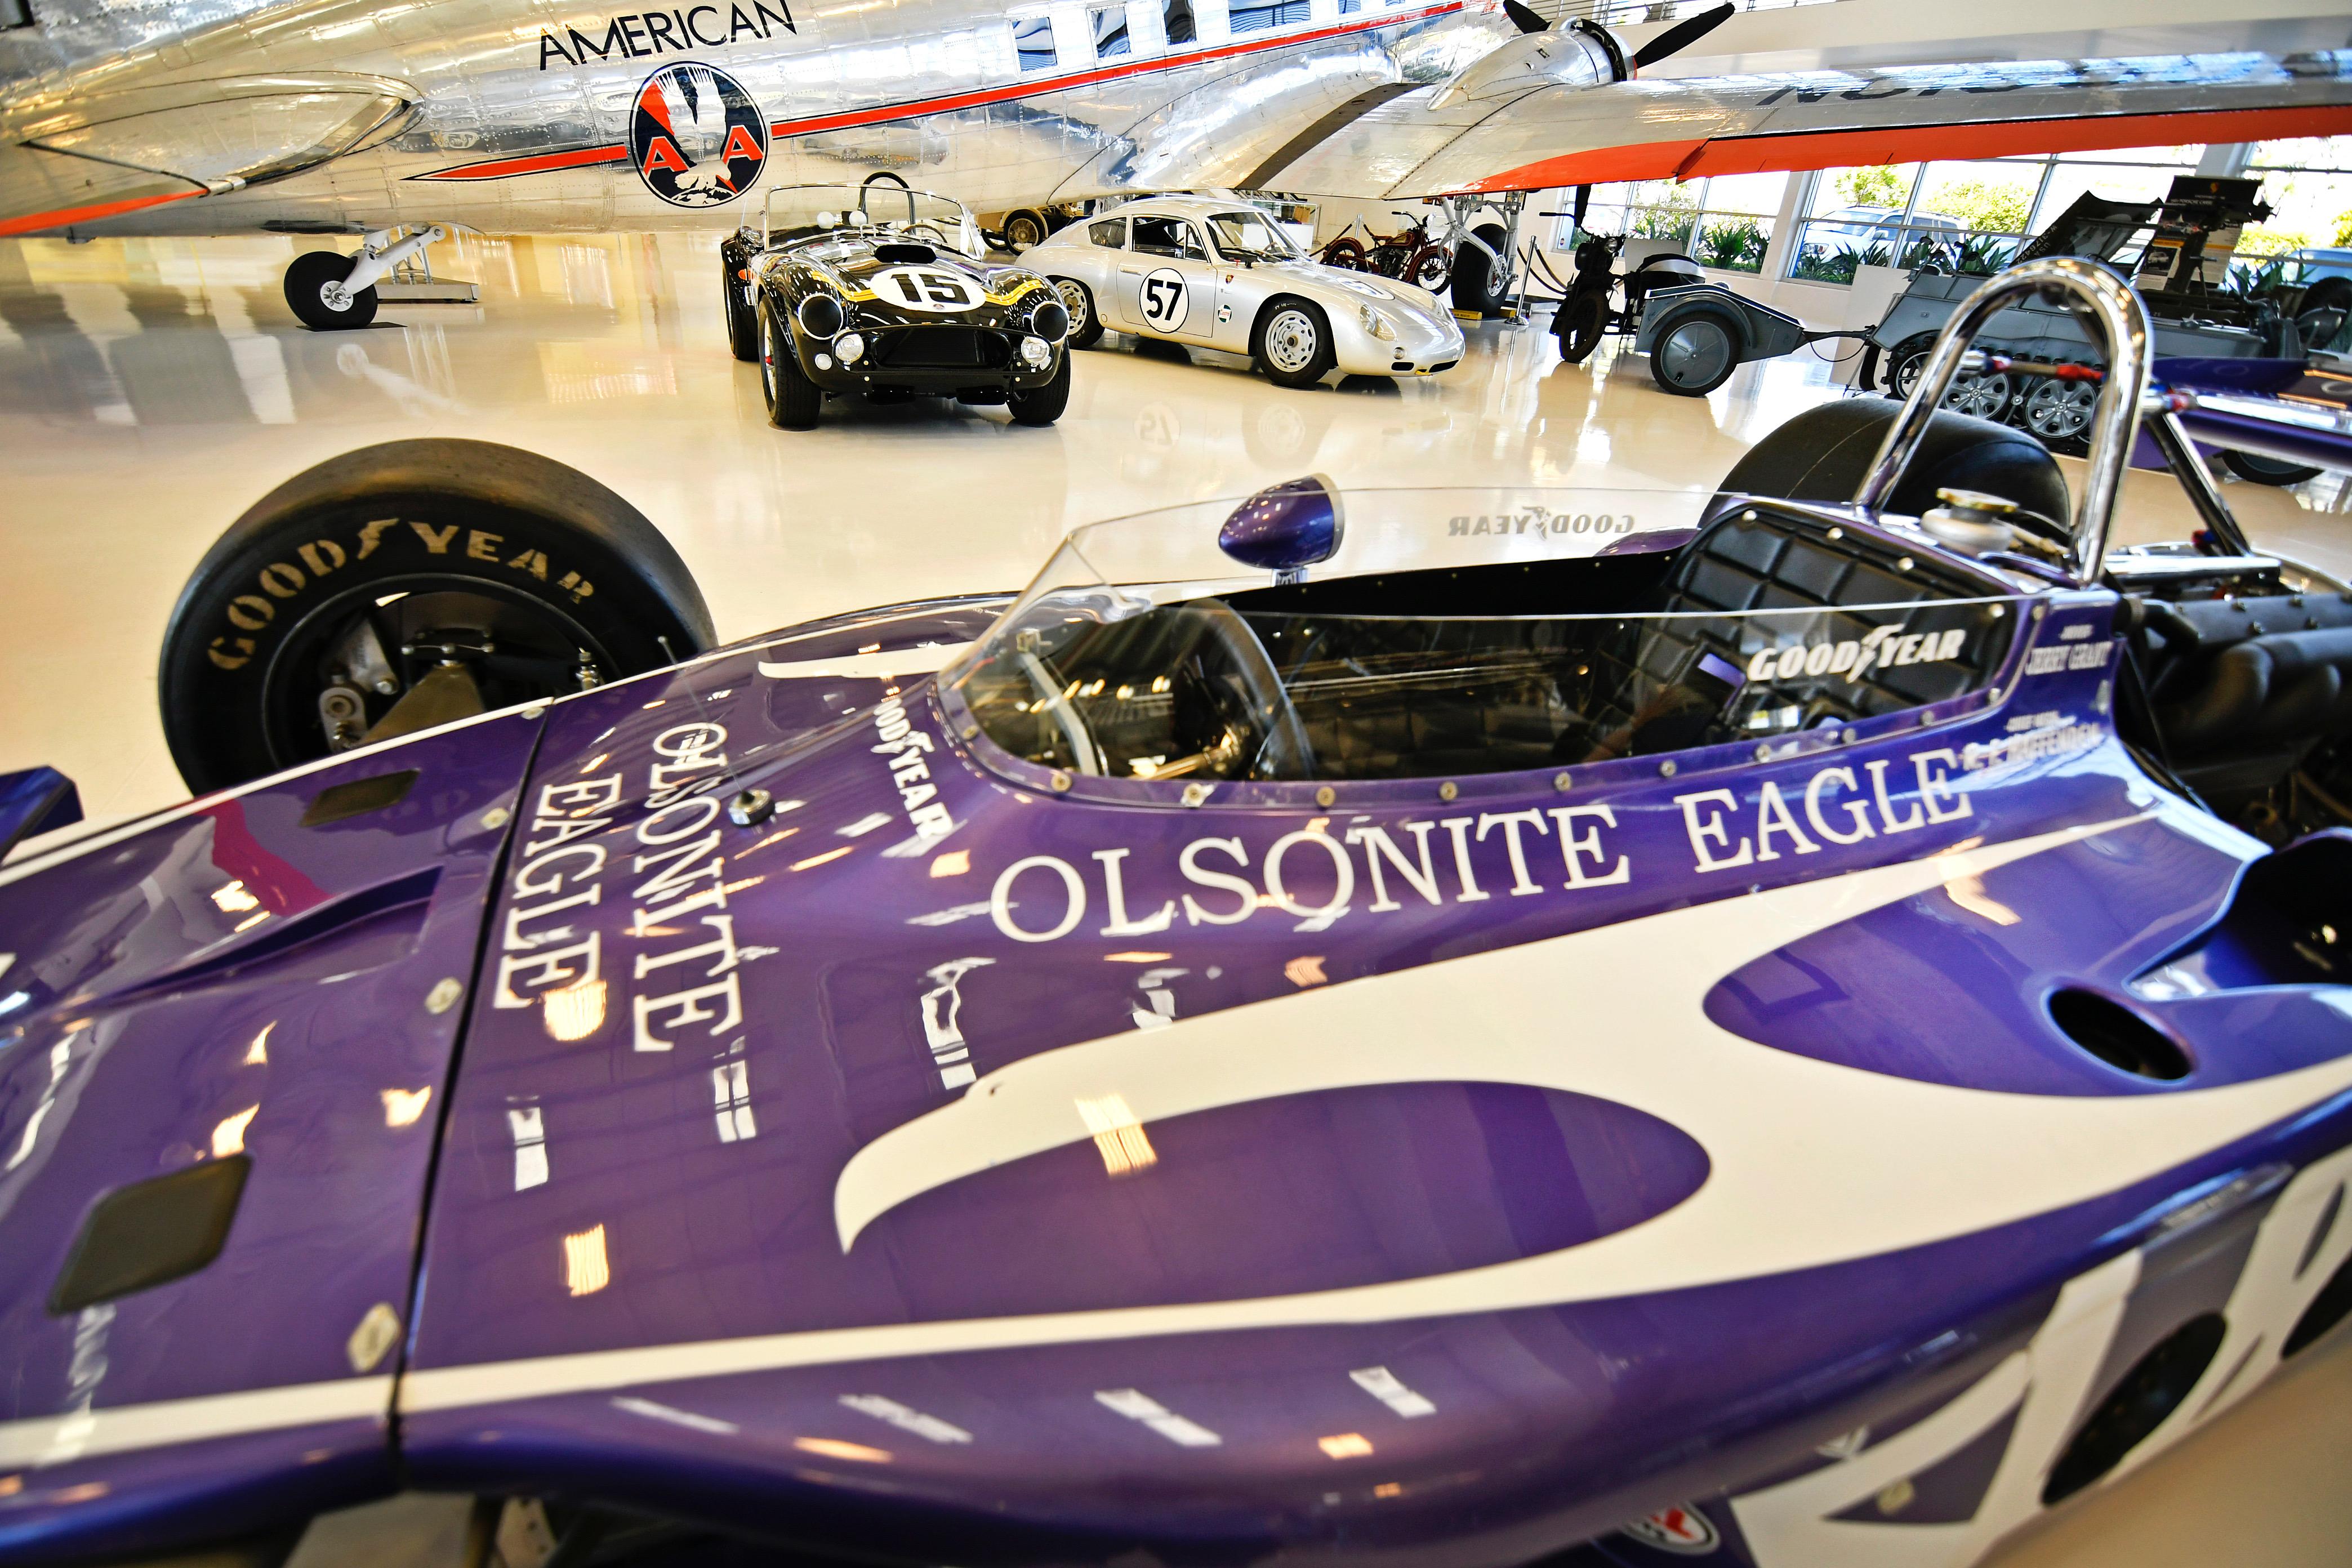 California air museum features Gurney s racing cars